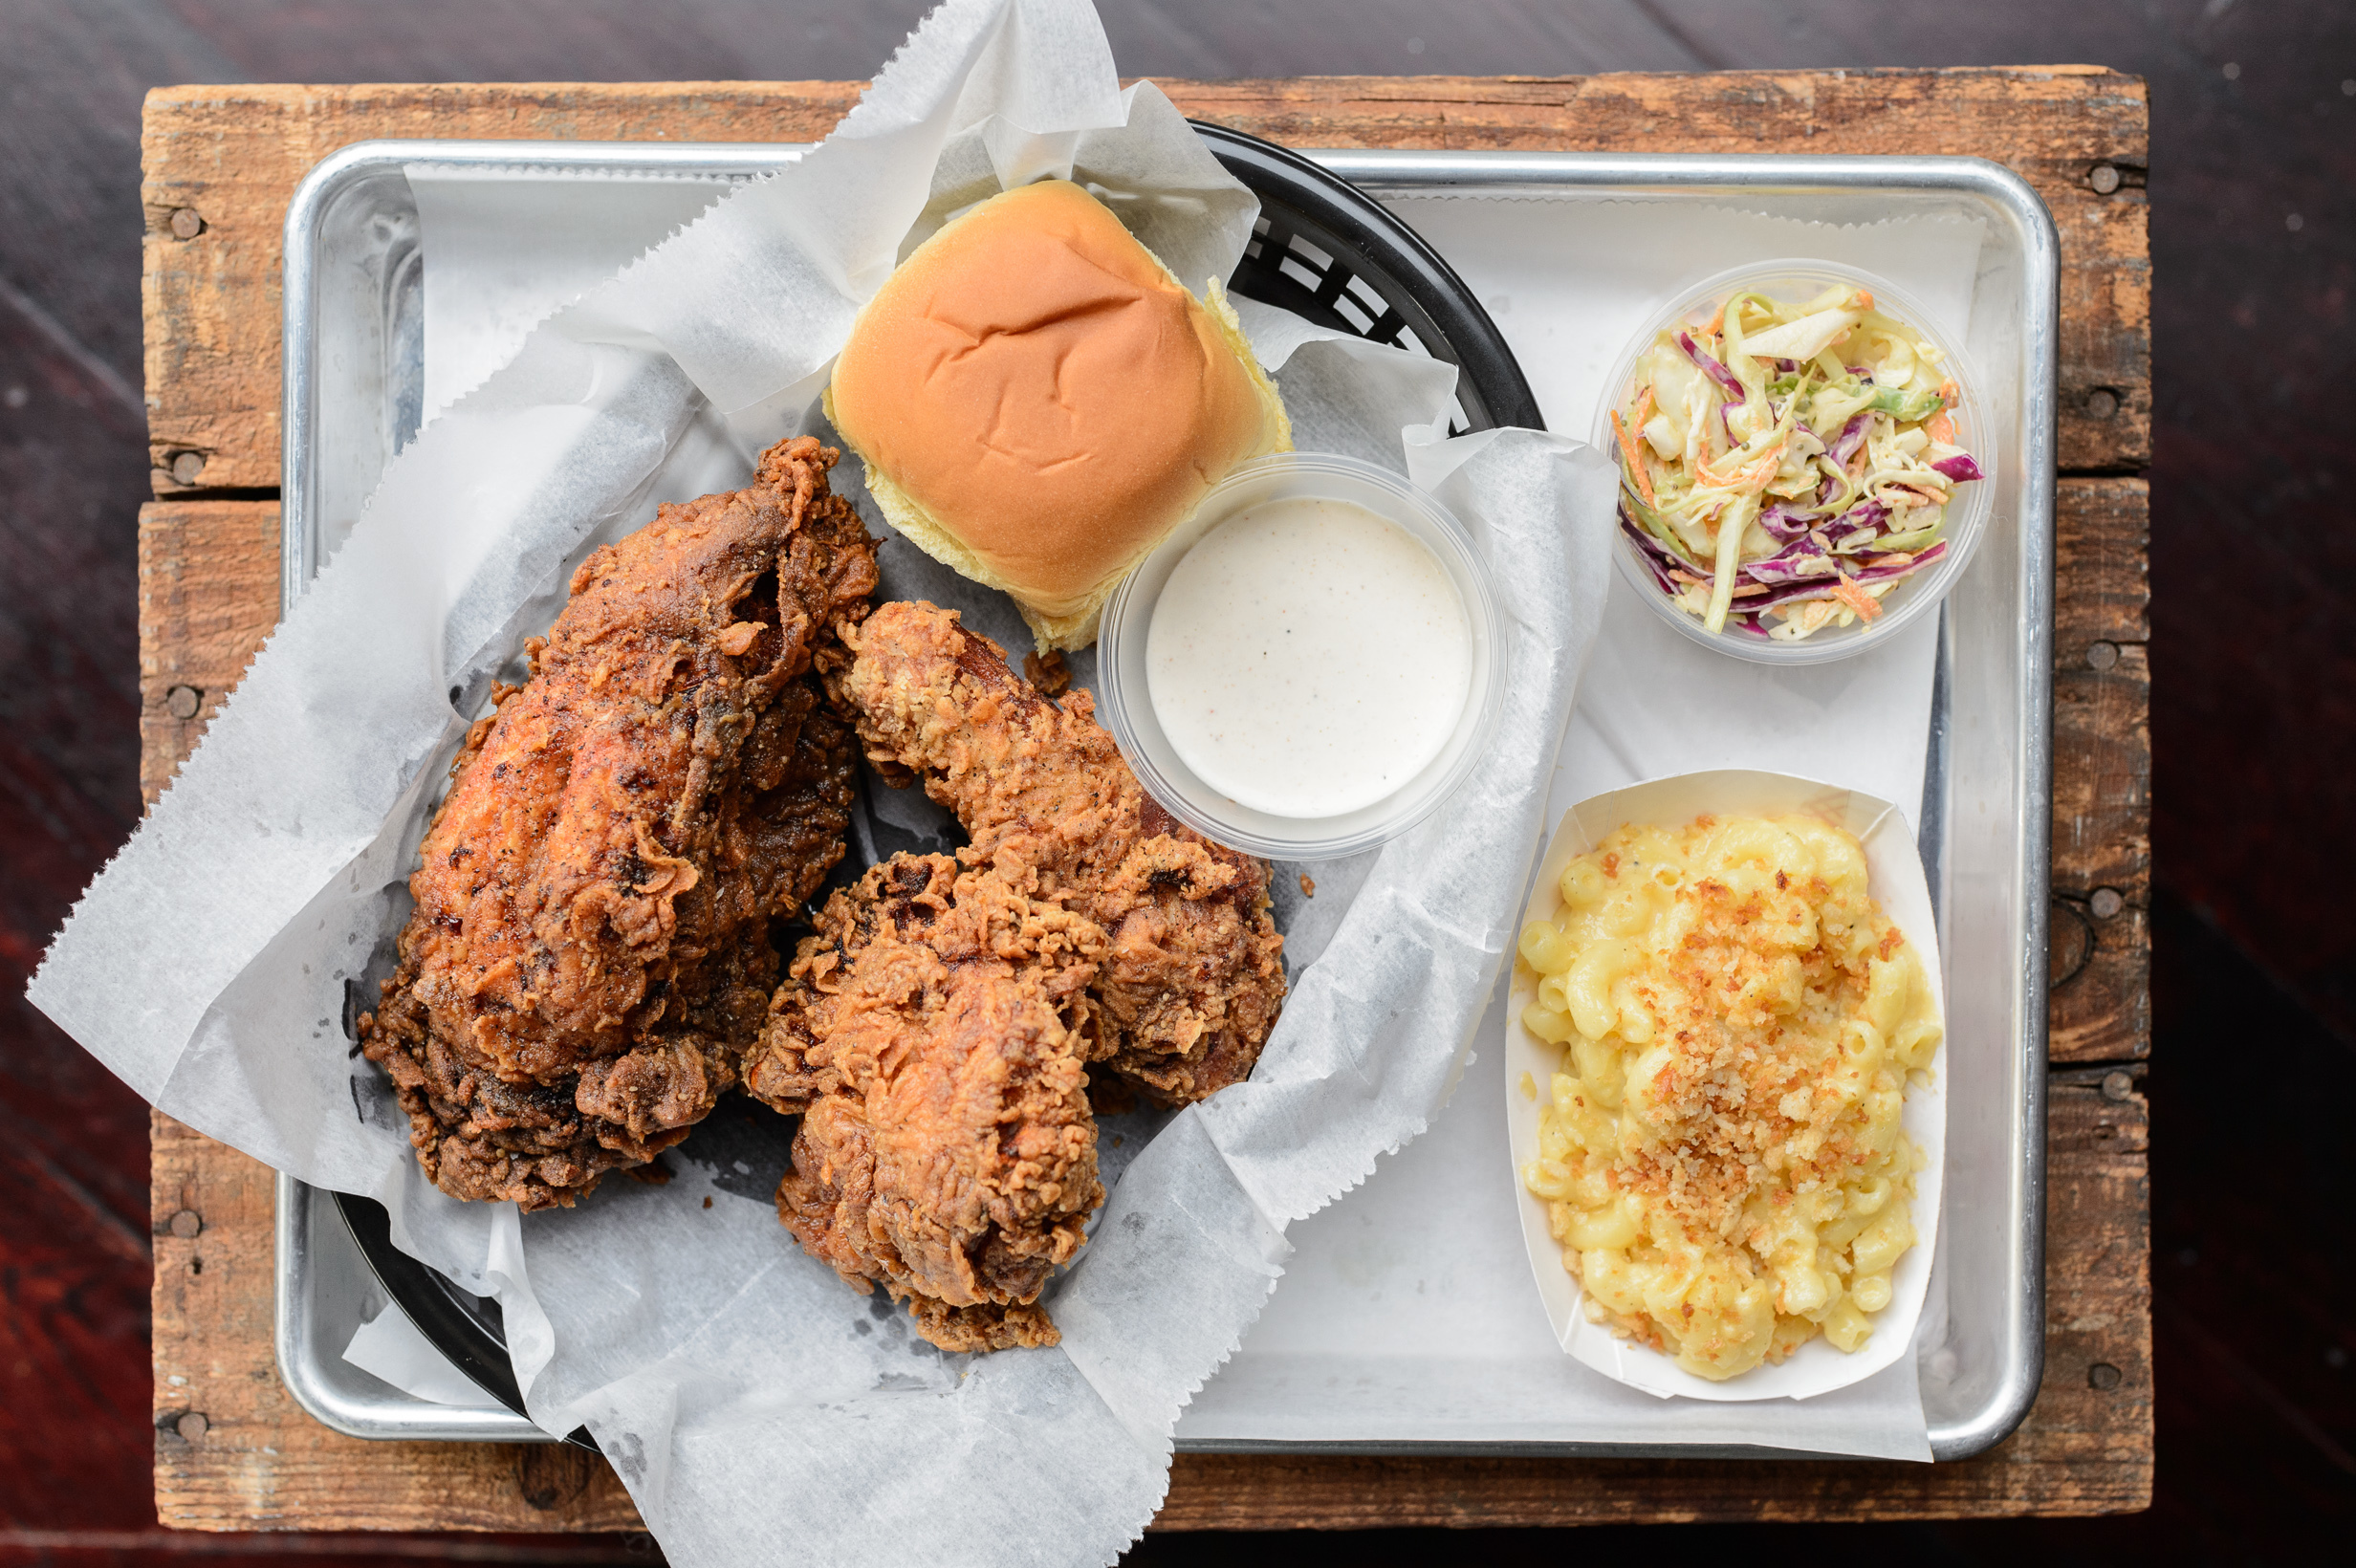 Chicken dinner at Wilma Jean